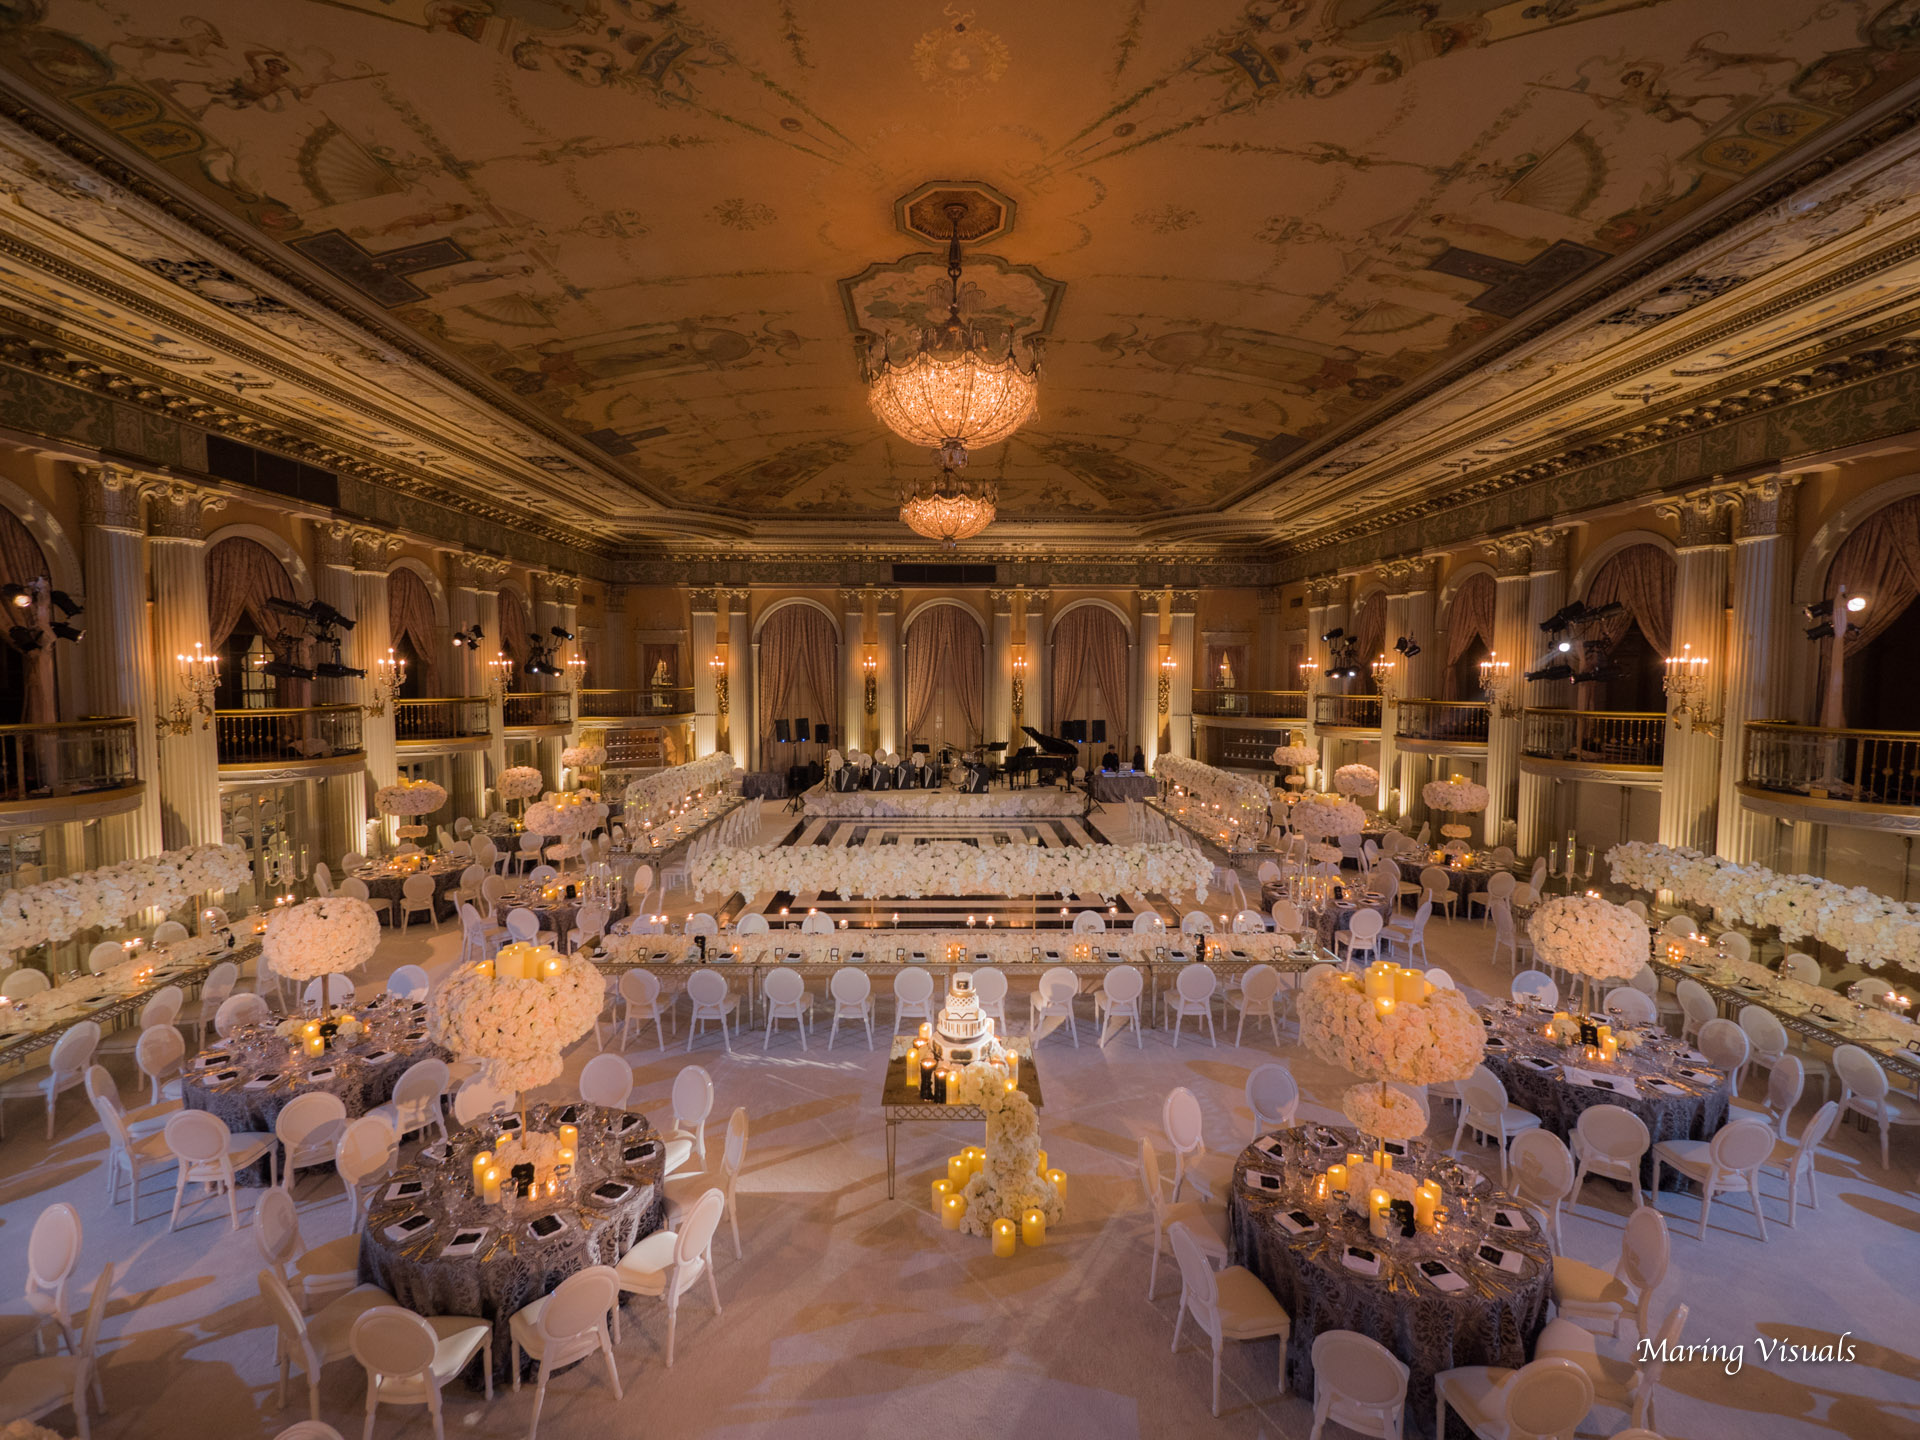 David Tutera Weddings by Maring Visuals 00541.jpg